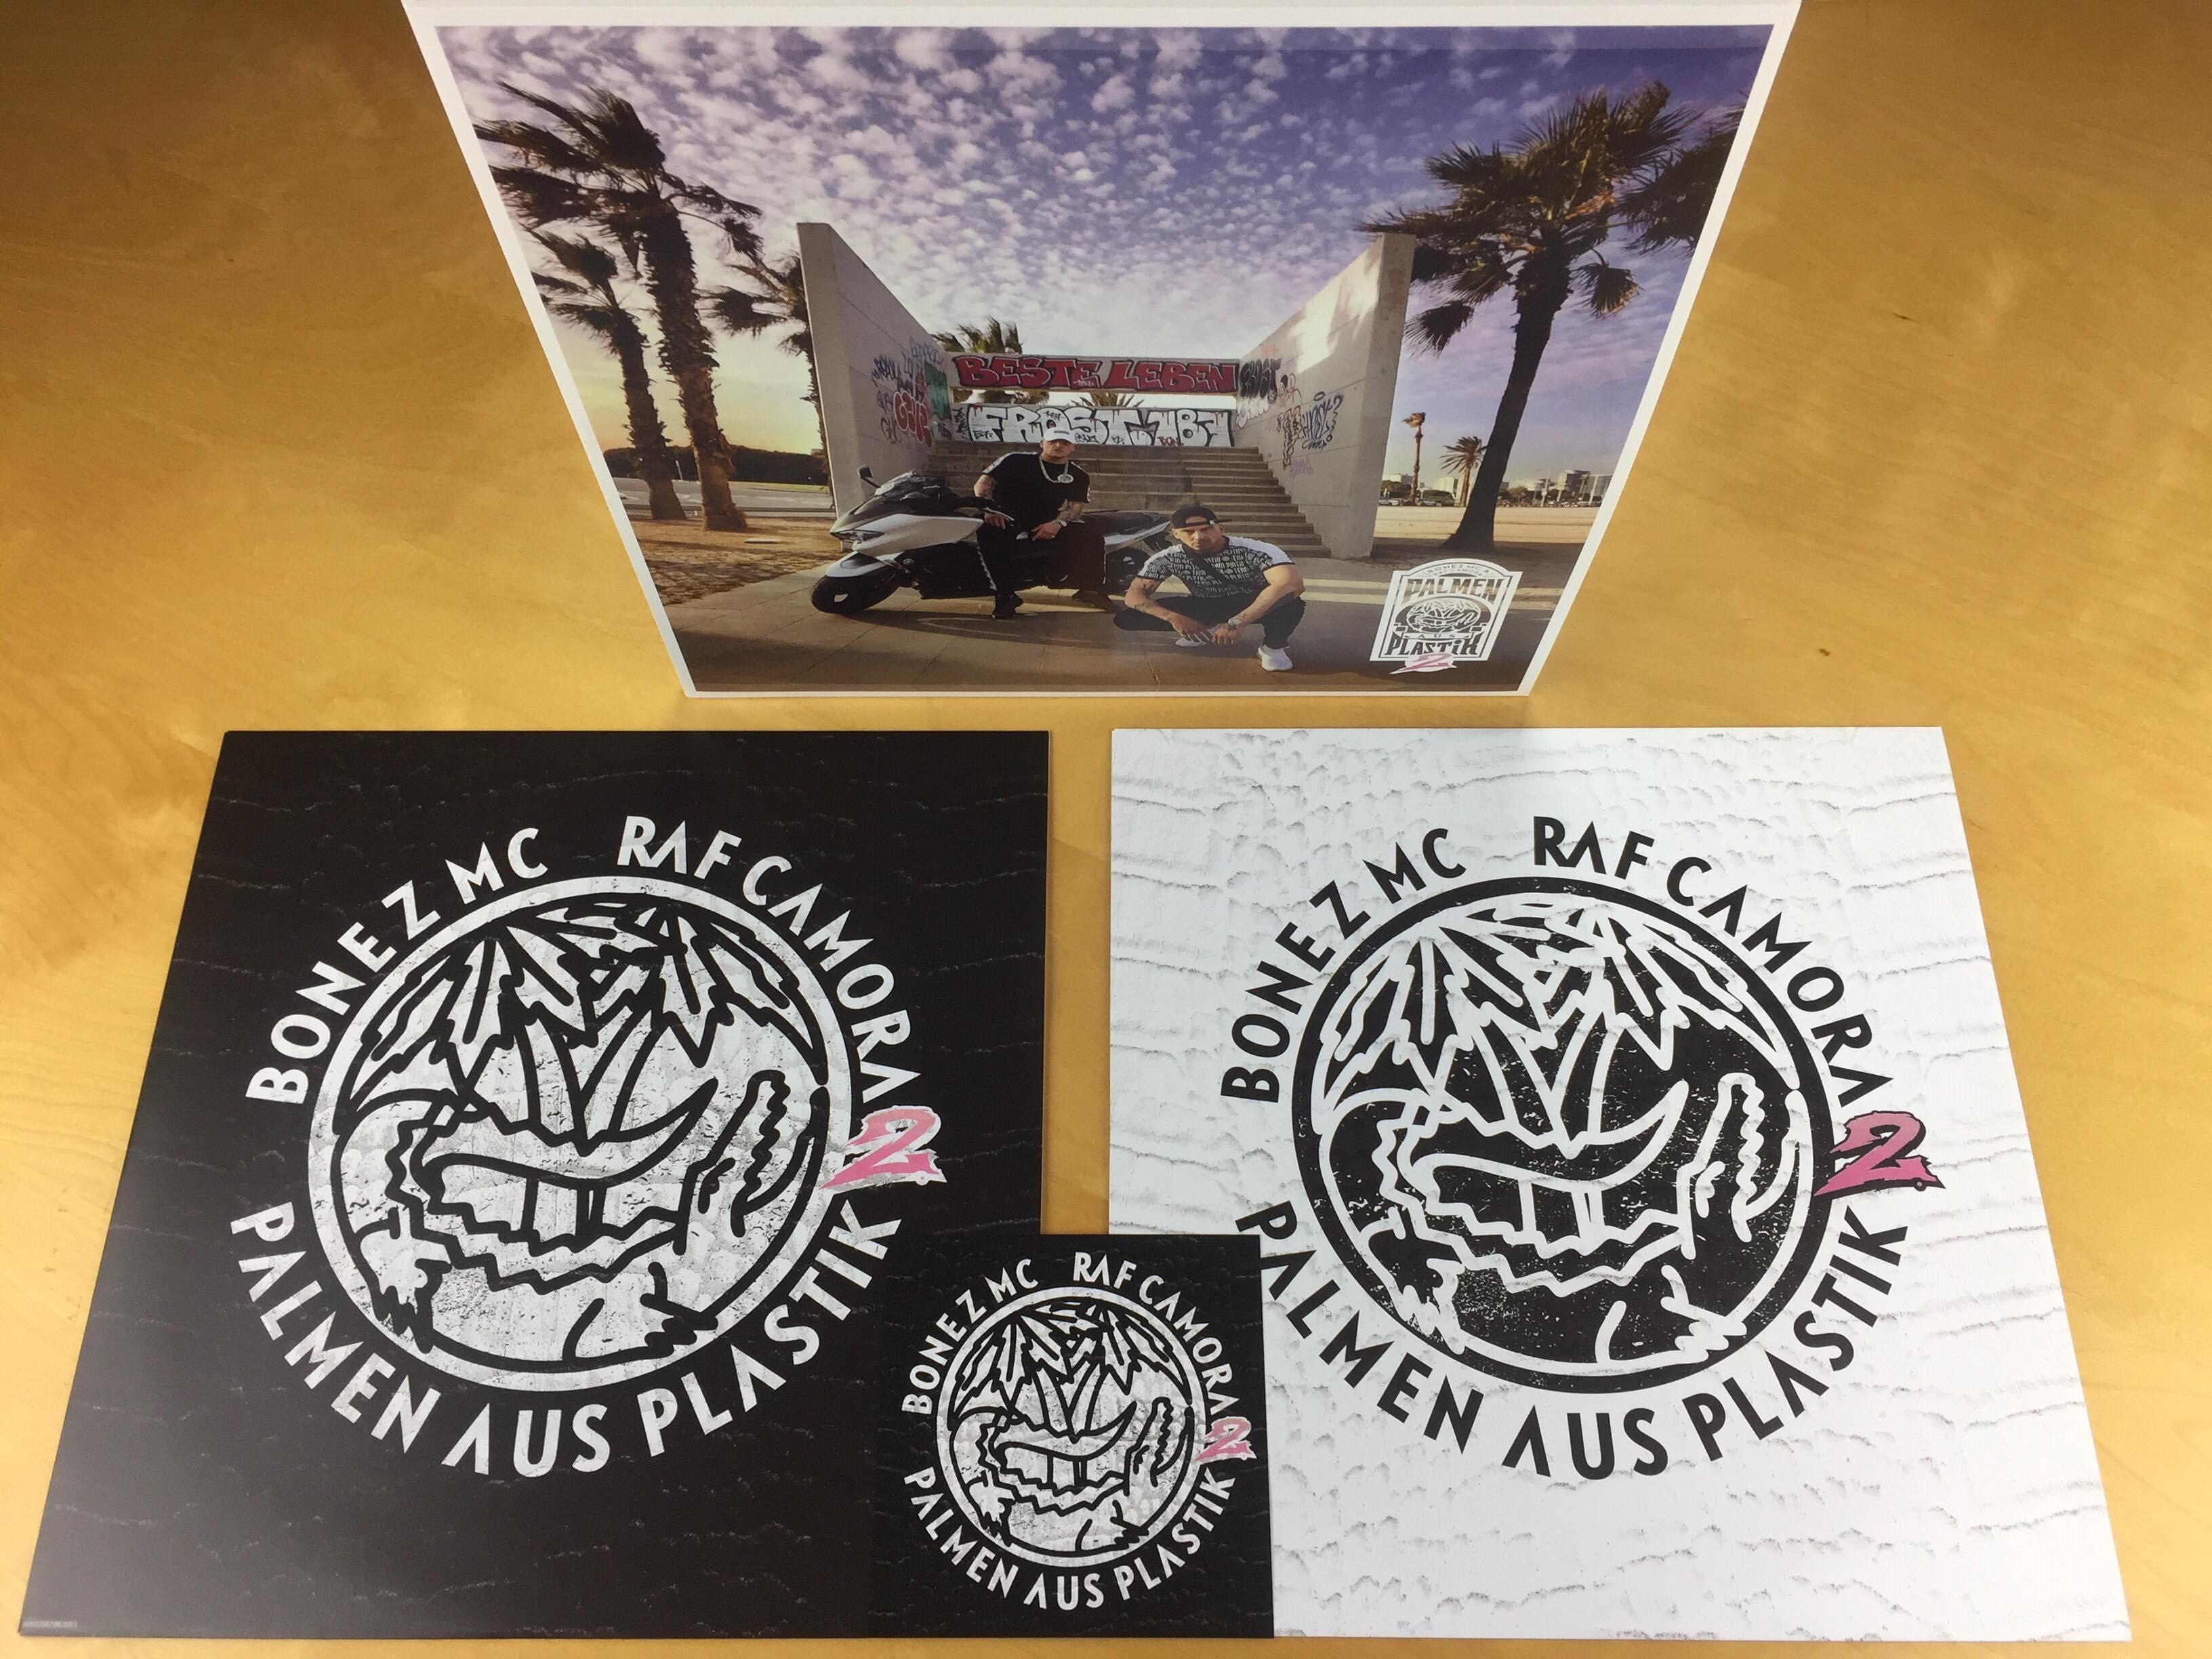 Bonez Mc Raf Camora Palmen Aus Plastik 2 Cover Features